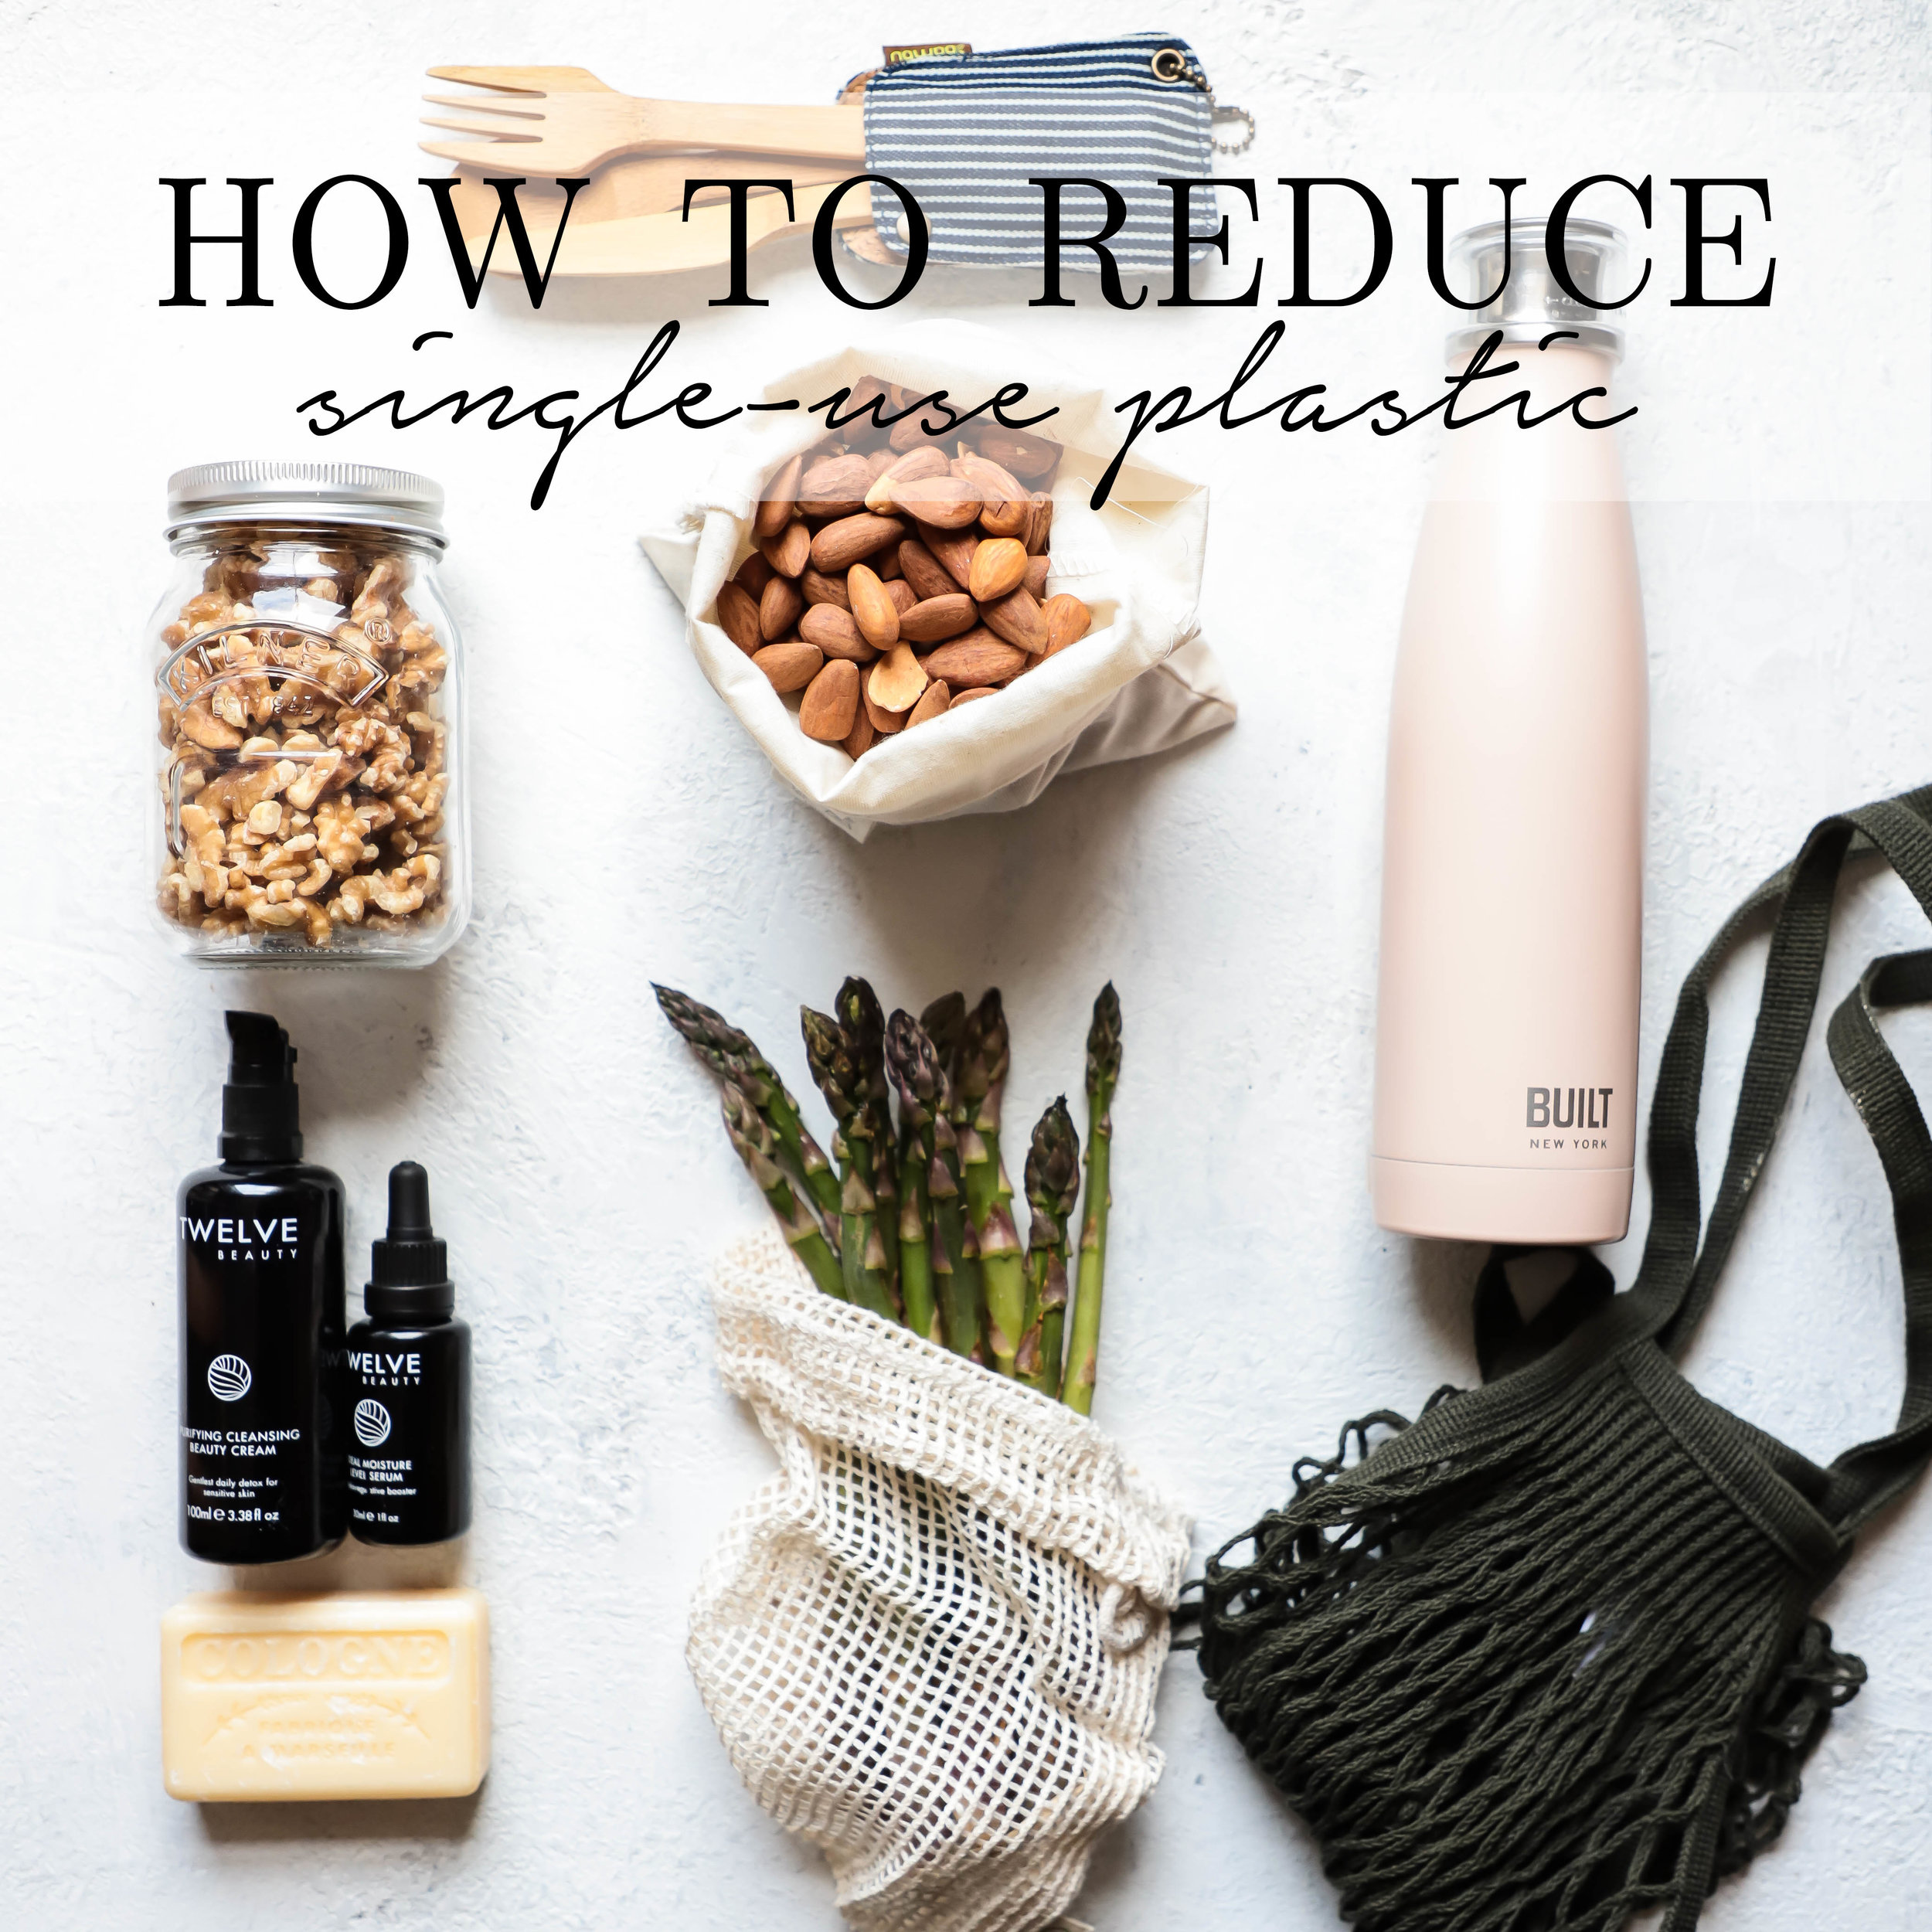 ways to reduce single-use plastic